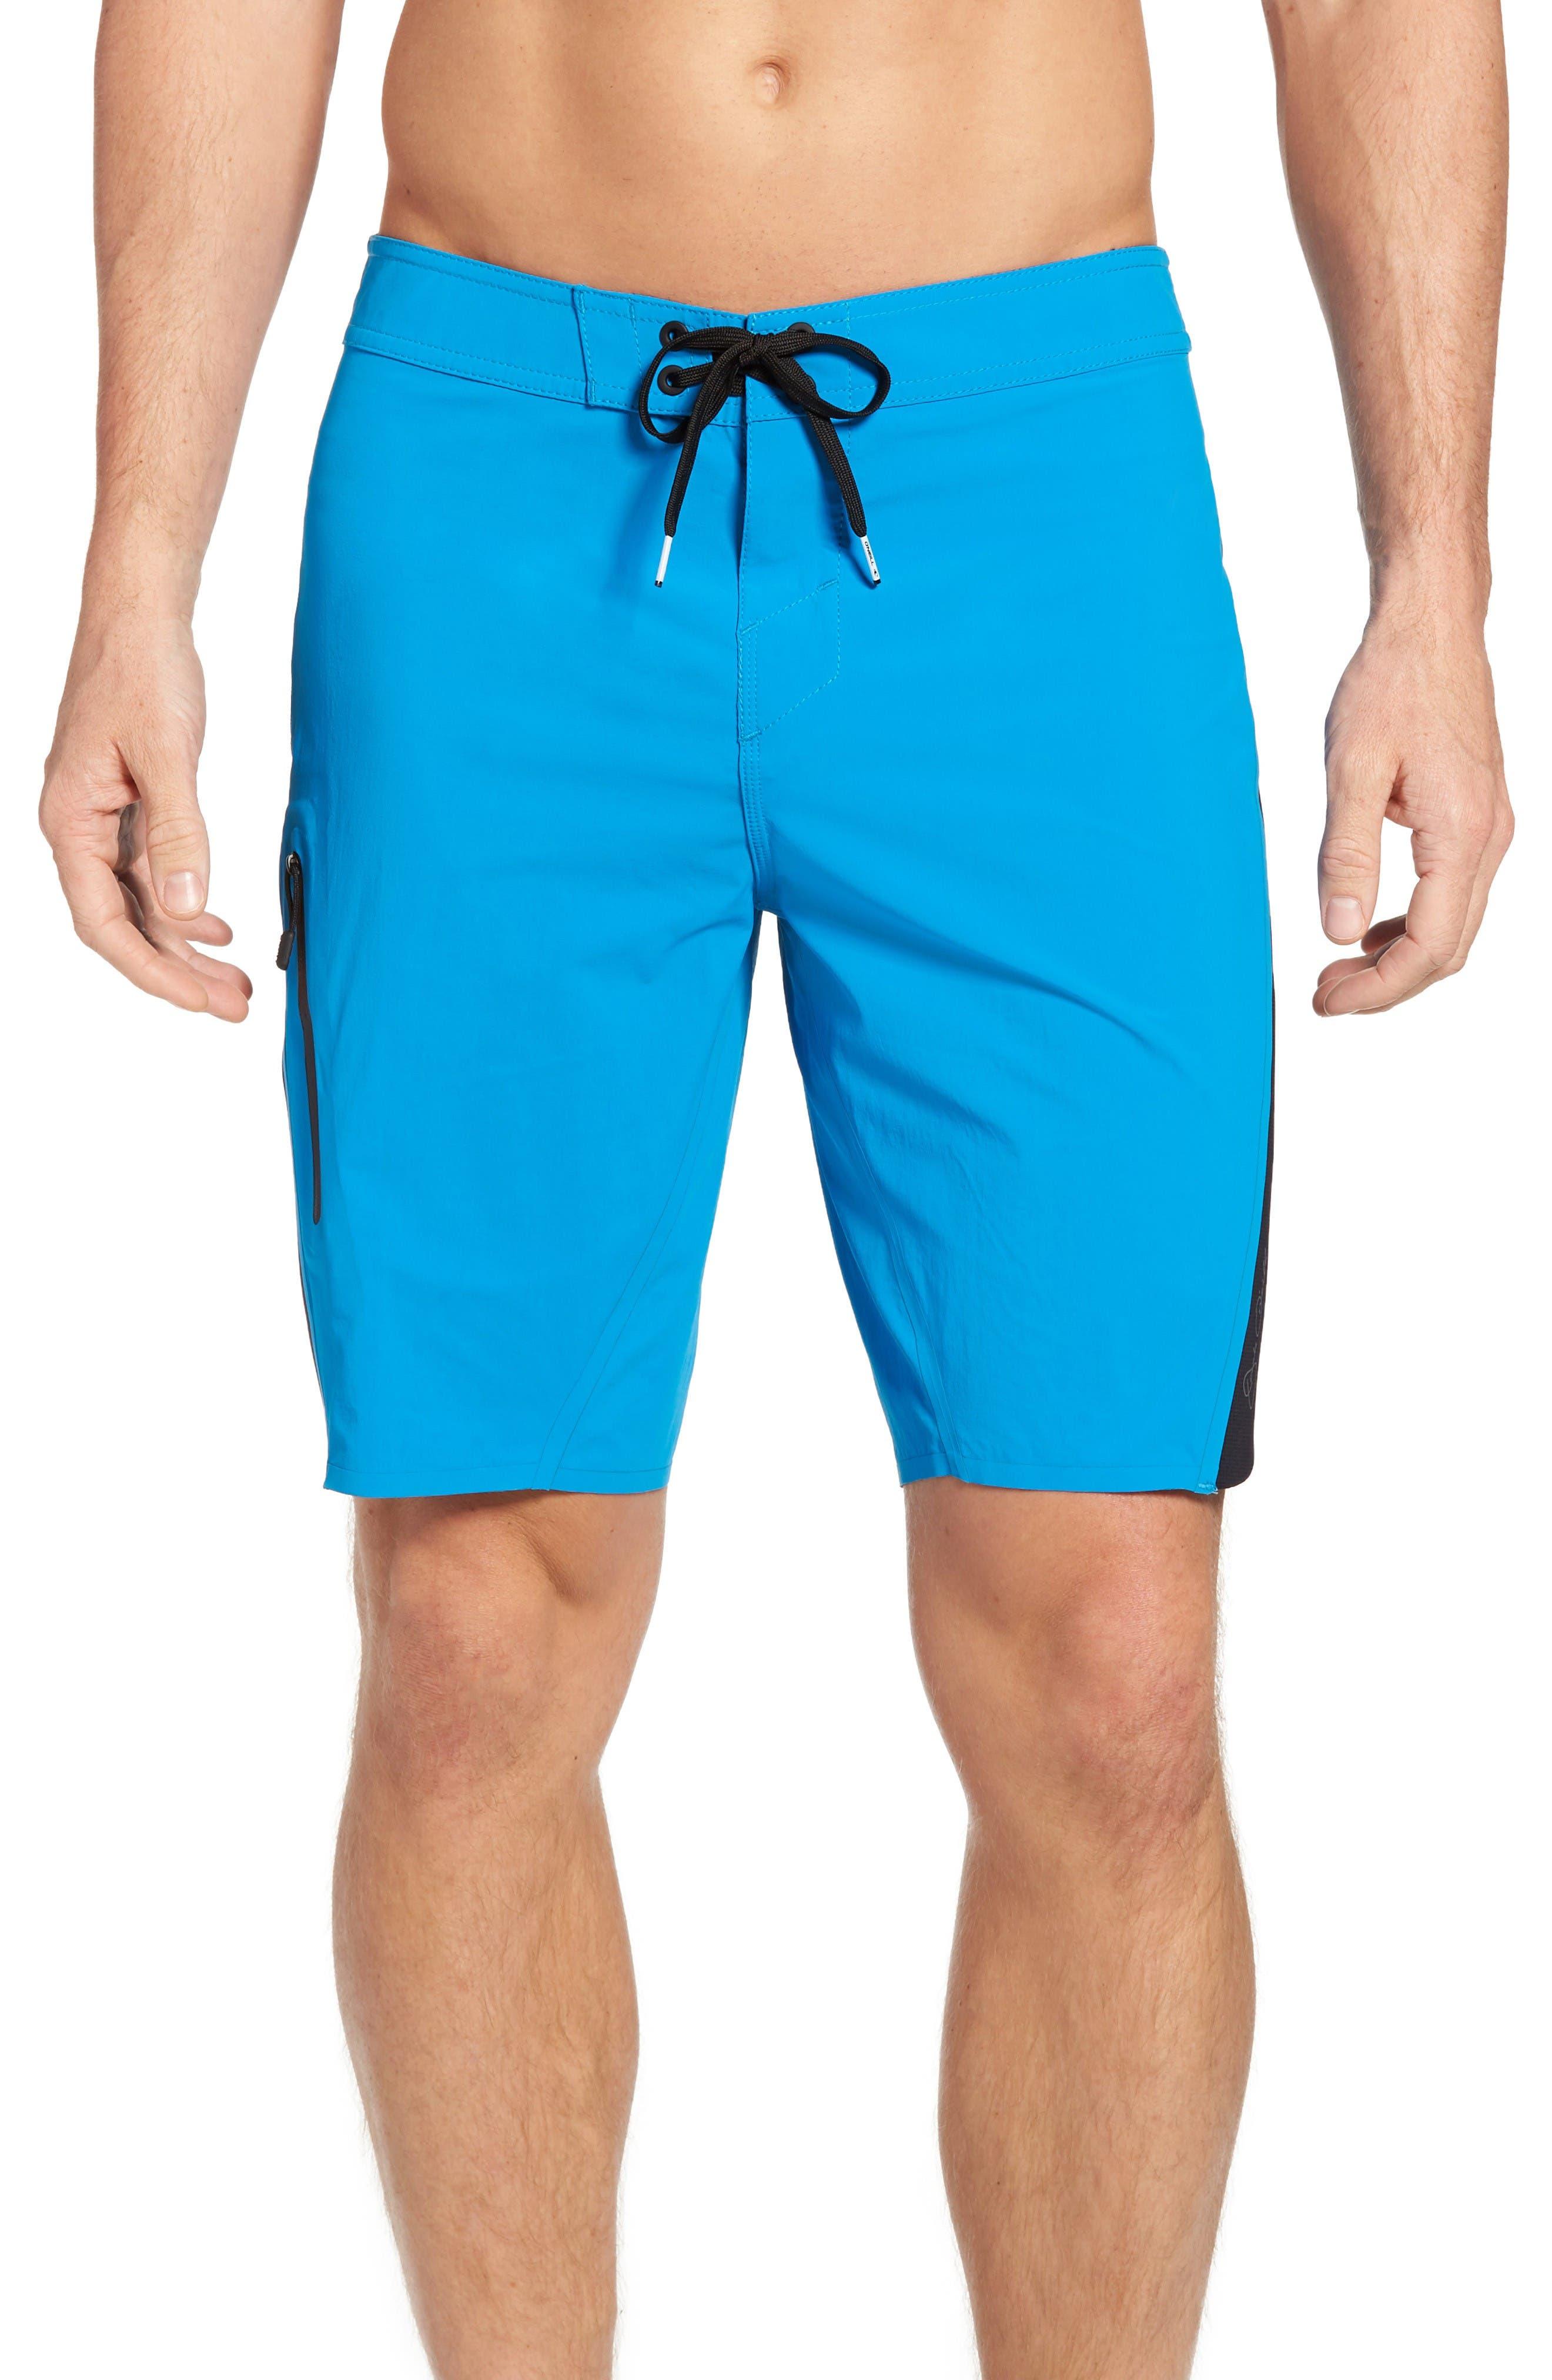 Jack O'Neill Superfreak Paddler Board Shorts (Regular & Big)